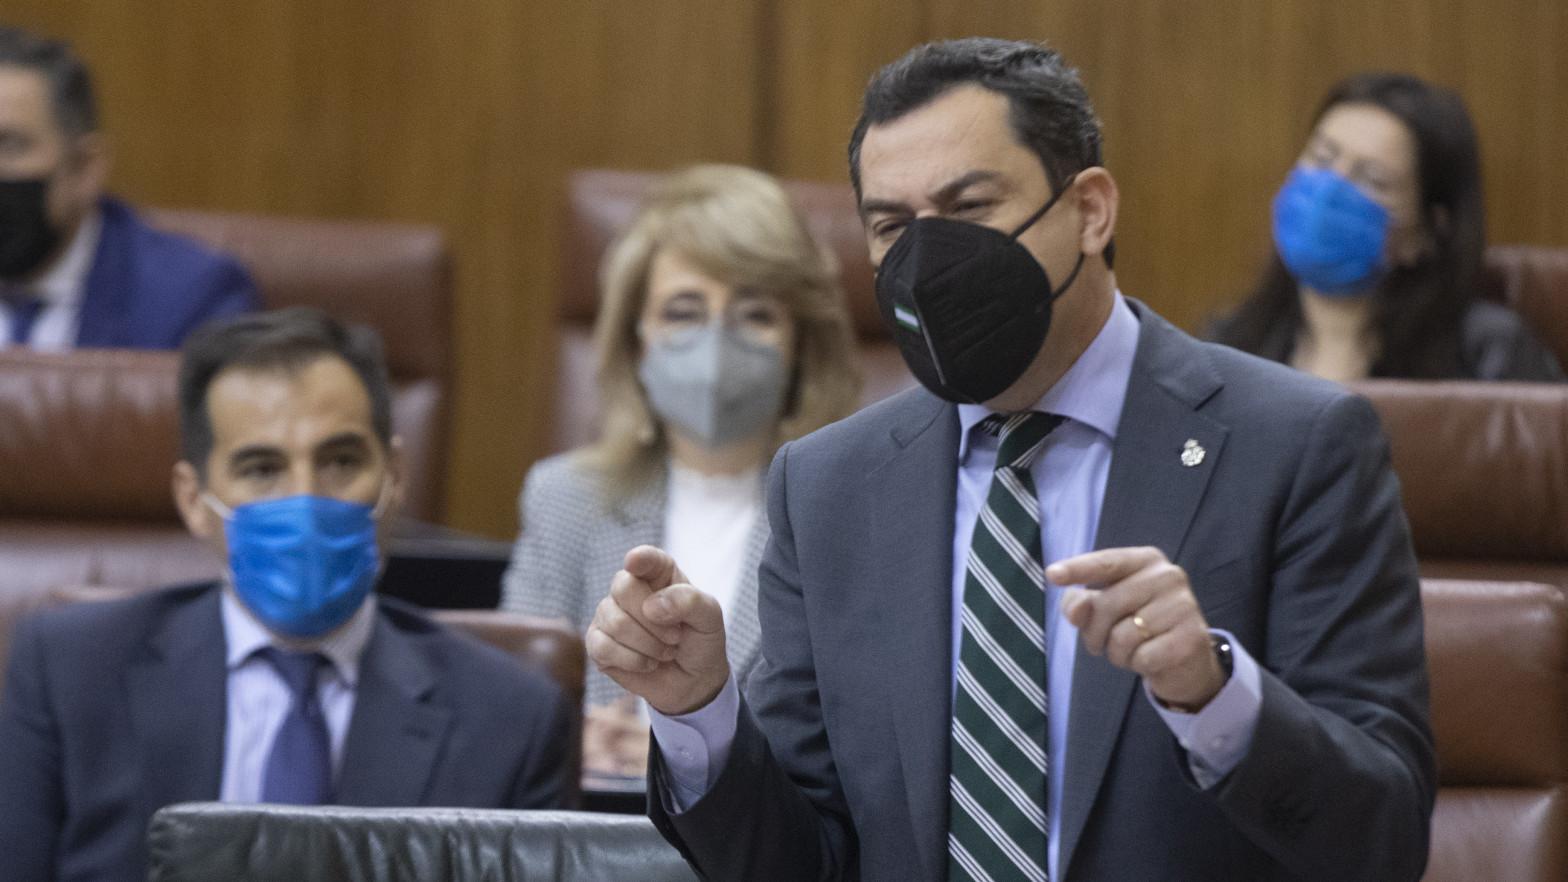 Juanma Moreno, positivo por coronavirus